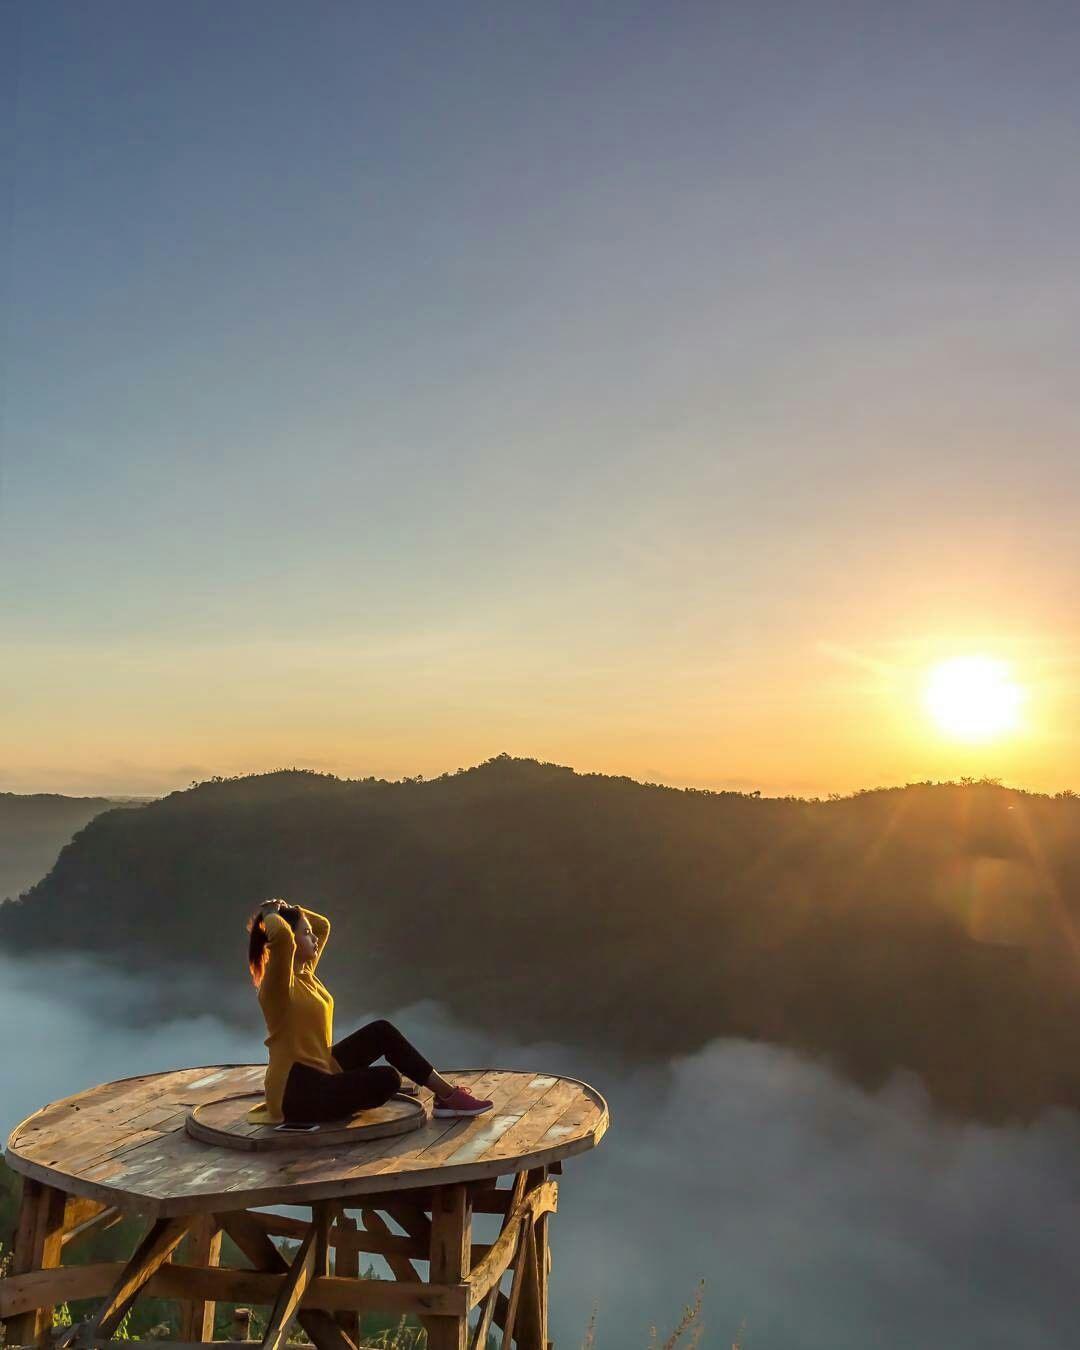 Bukit Panguk Kediwung, Bukit Panguk Kediwung Yogyakarta, Yogyakarta, Dolan Dolen, Dolaners Bukit Panguk Kediwung by onyone96 - Dolan Dolen